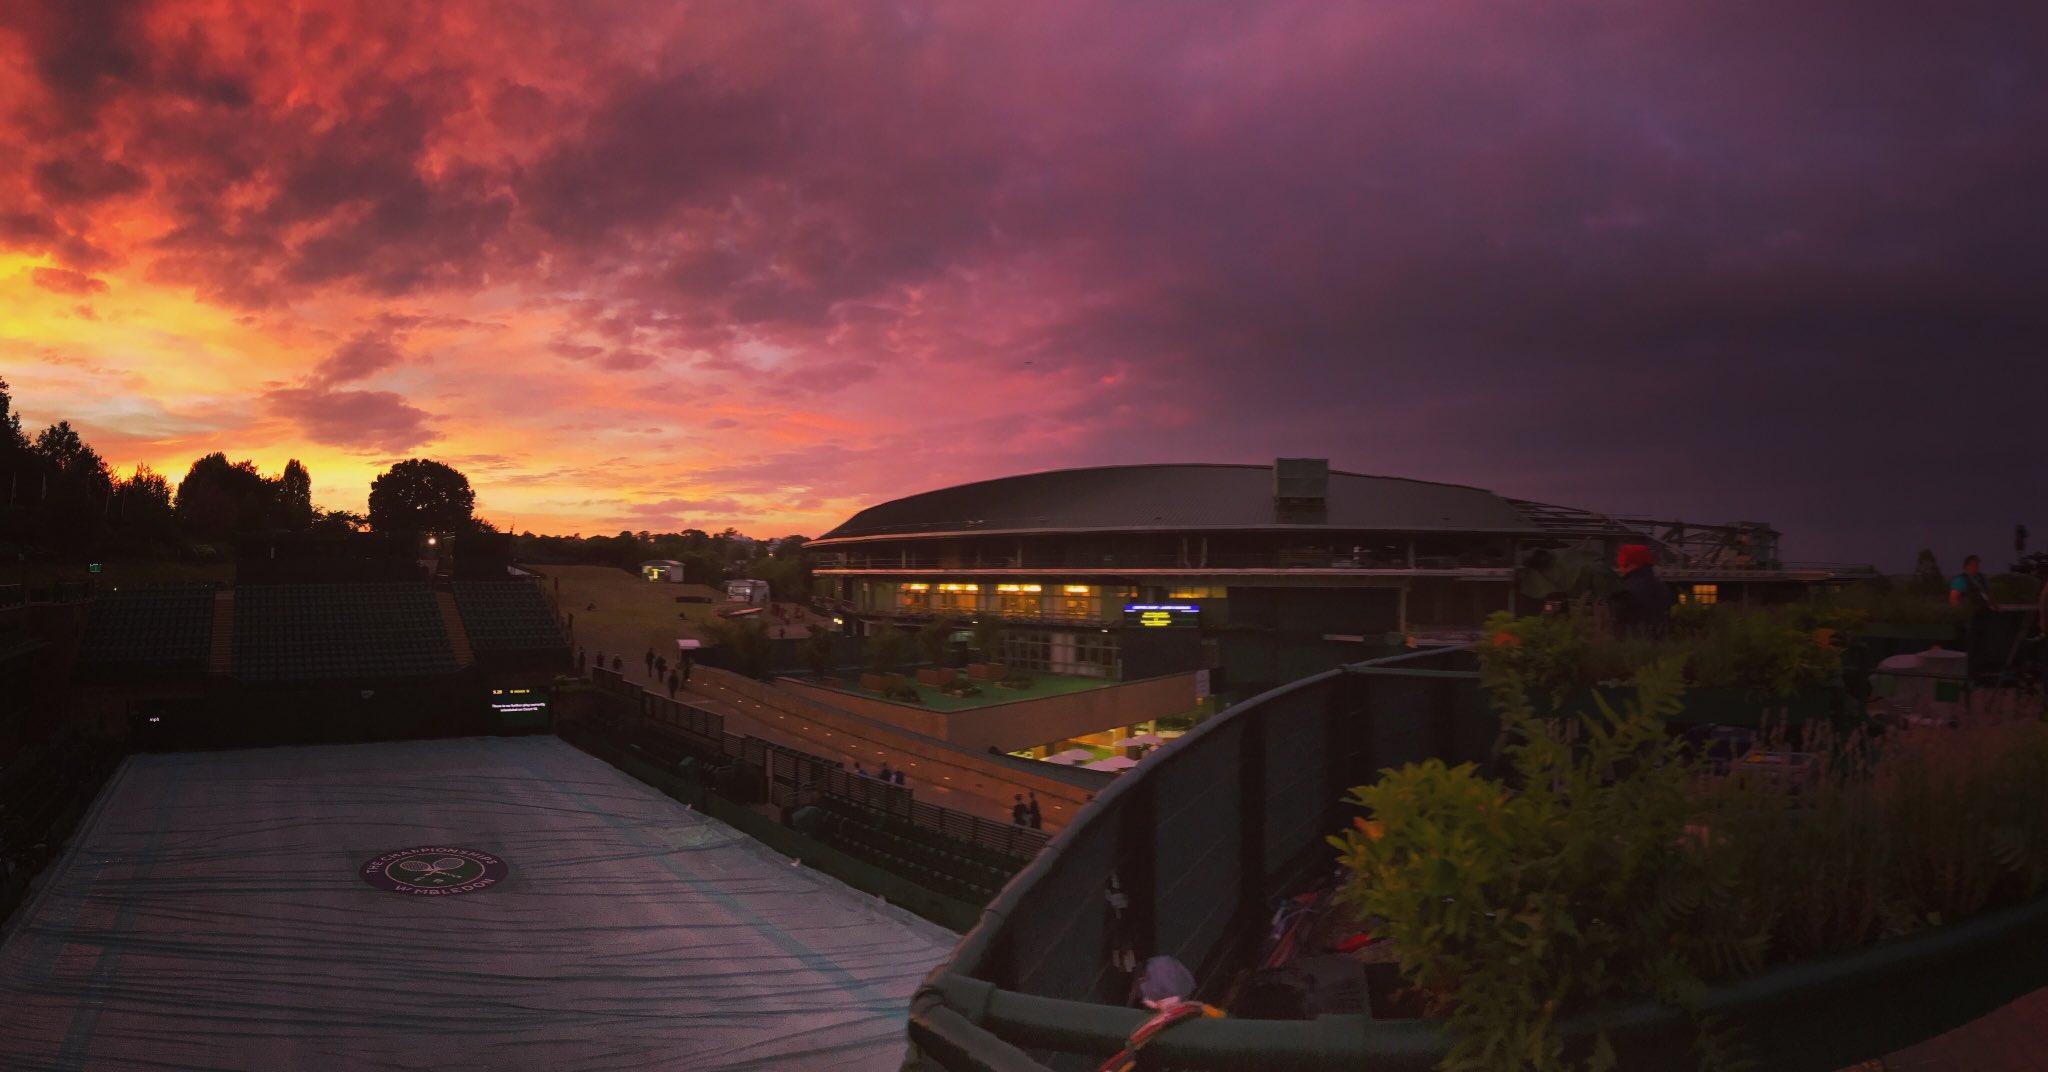 Wimbledon, we're going to miss you �� https://t.co/sU7fLqd5nn